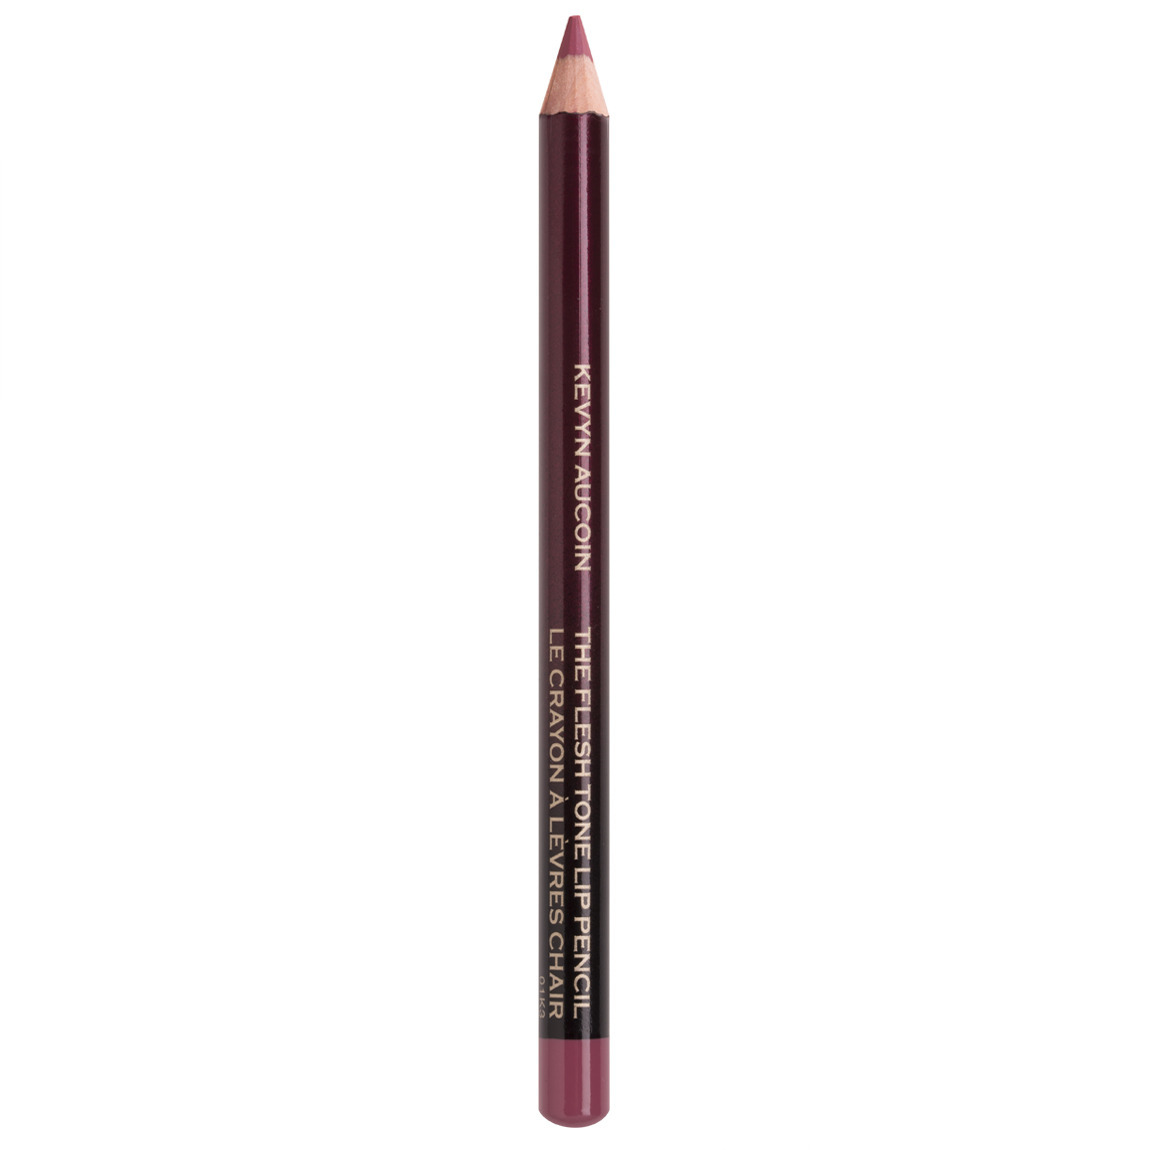 Kevyn Aucoin The Flesh Tone Lip Pencil Hyacinth